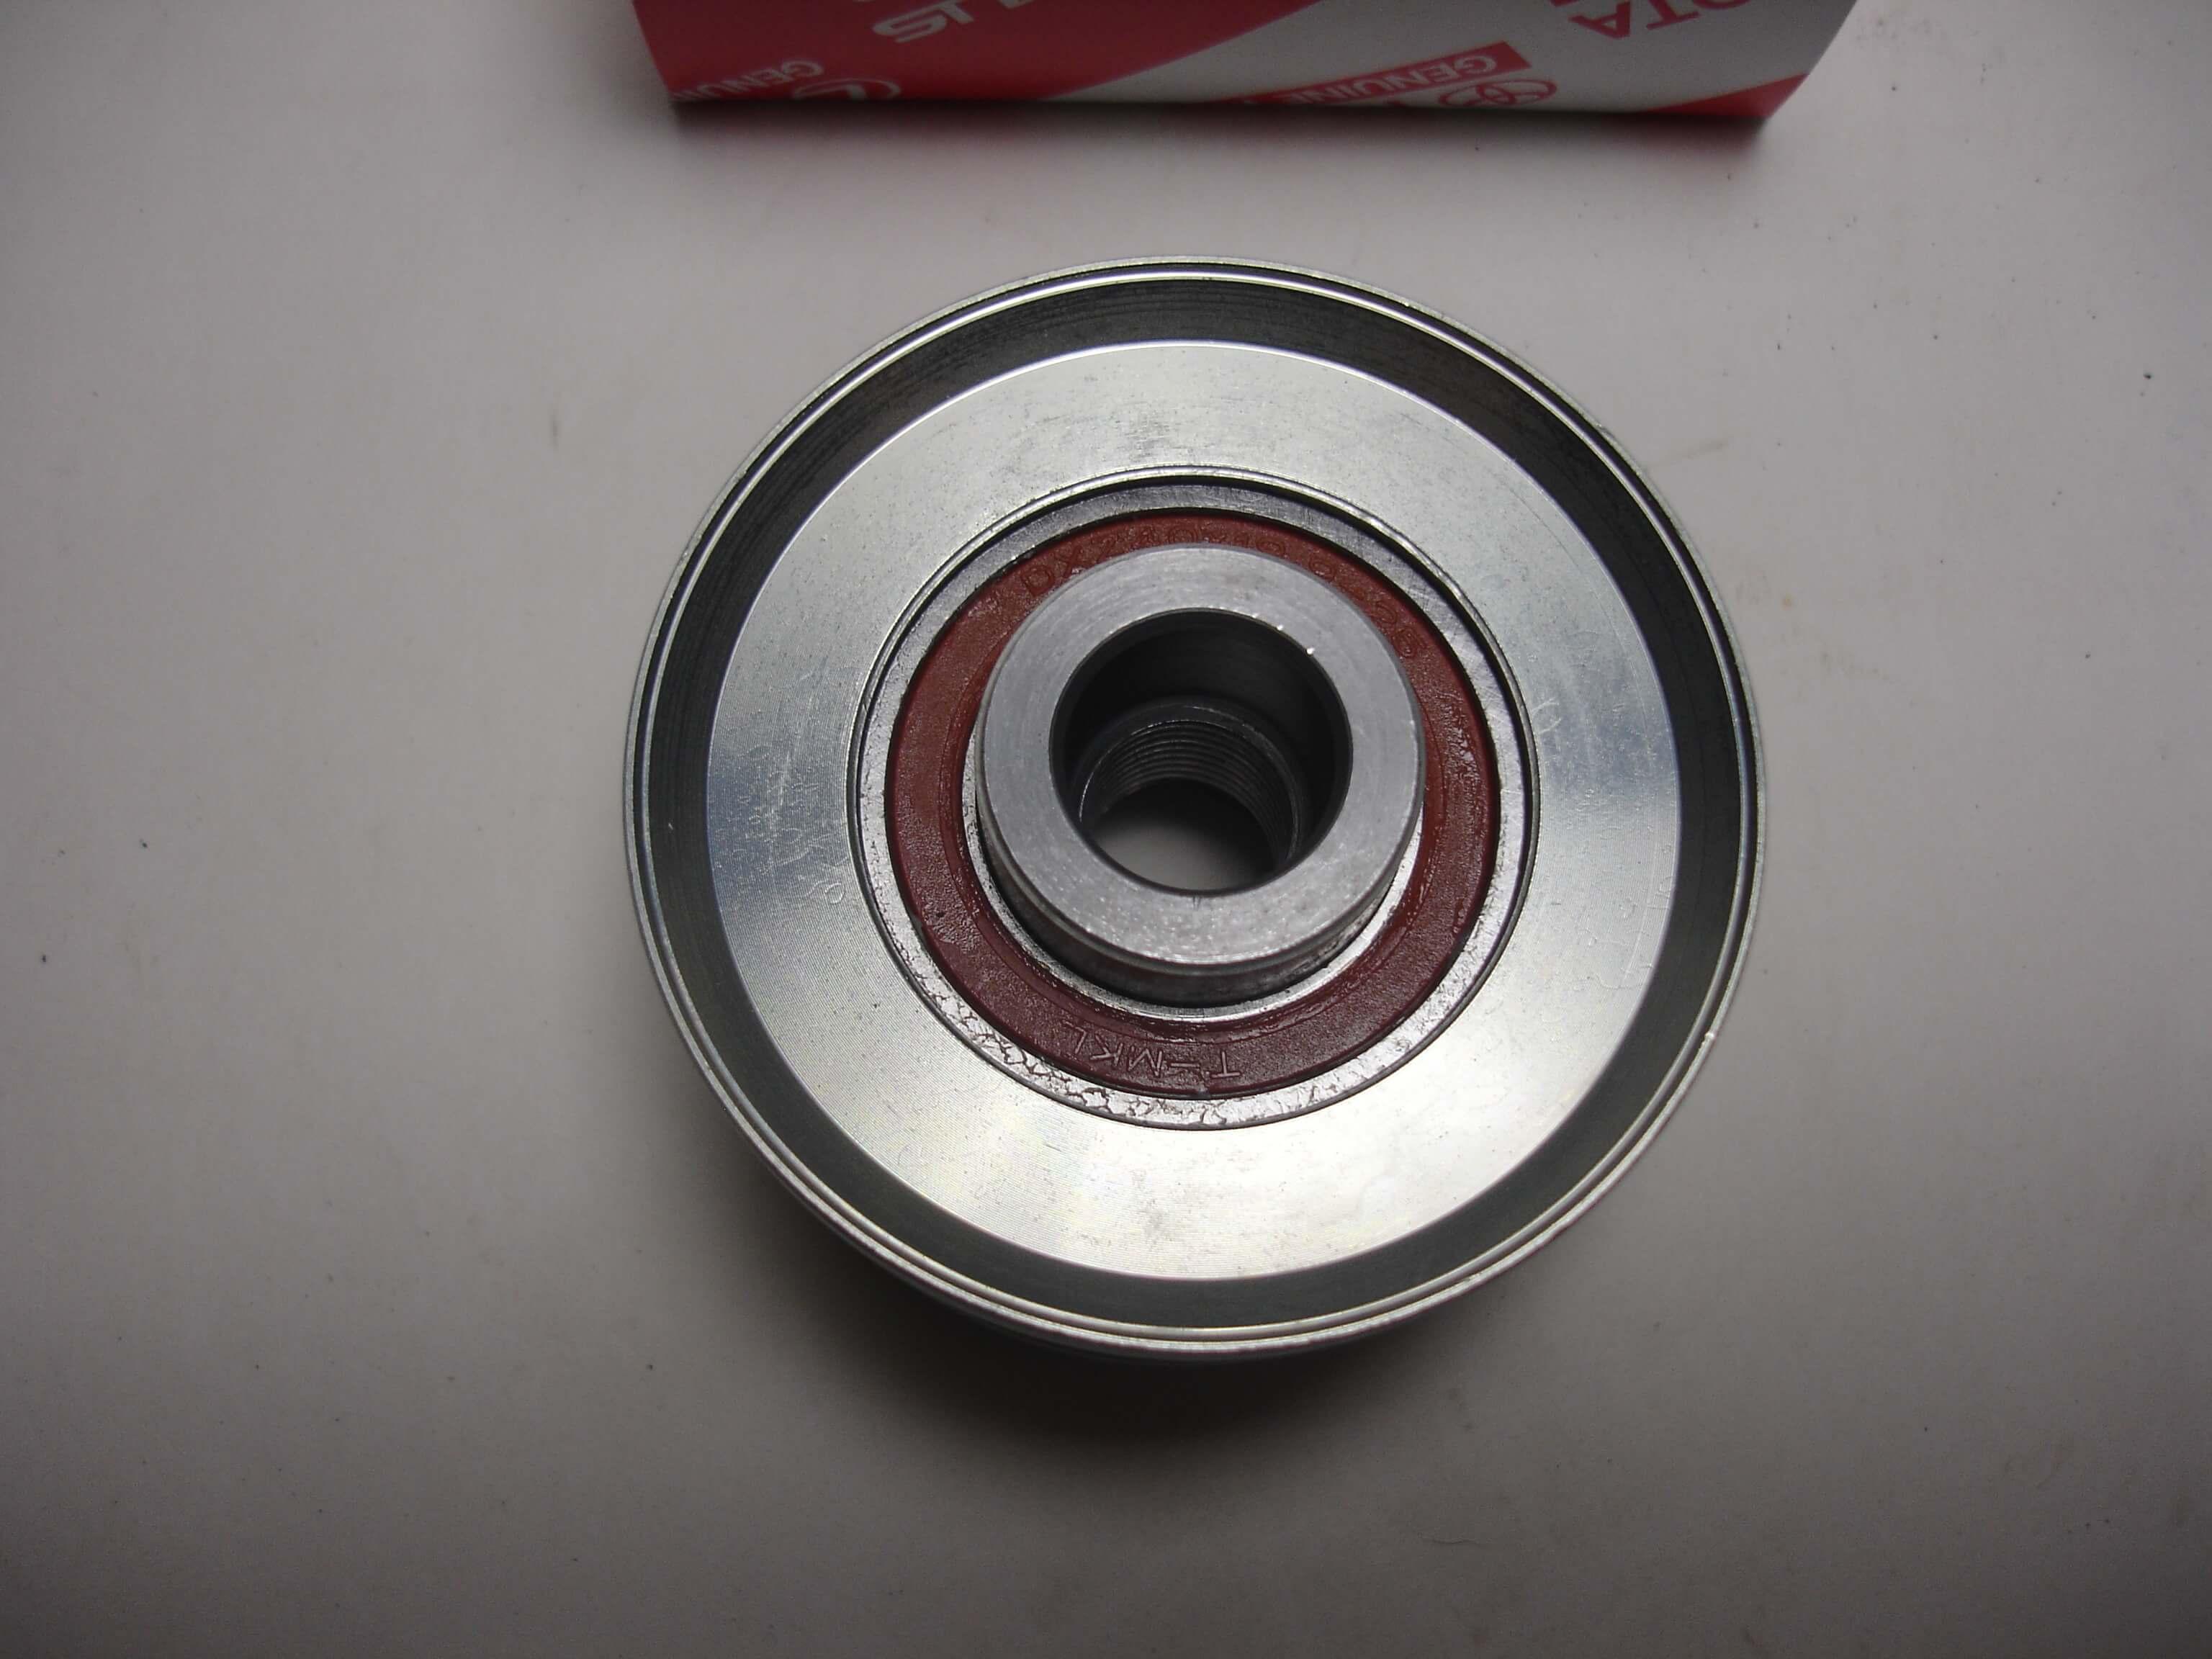 Toyota OEM Alternator Pulley With Clutch 27415-30020